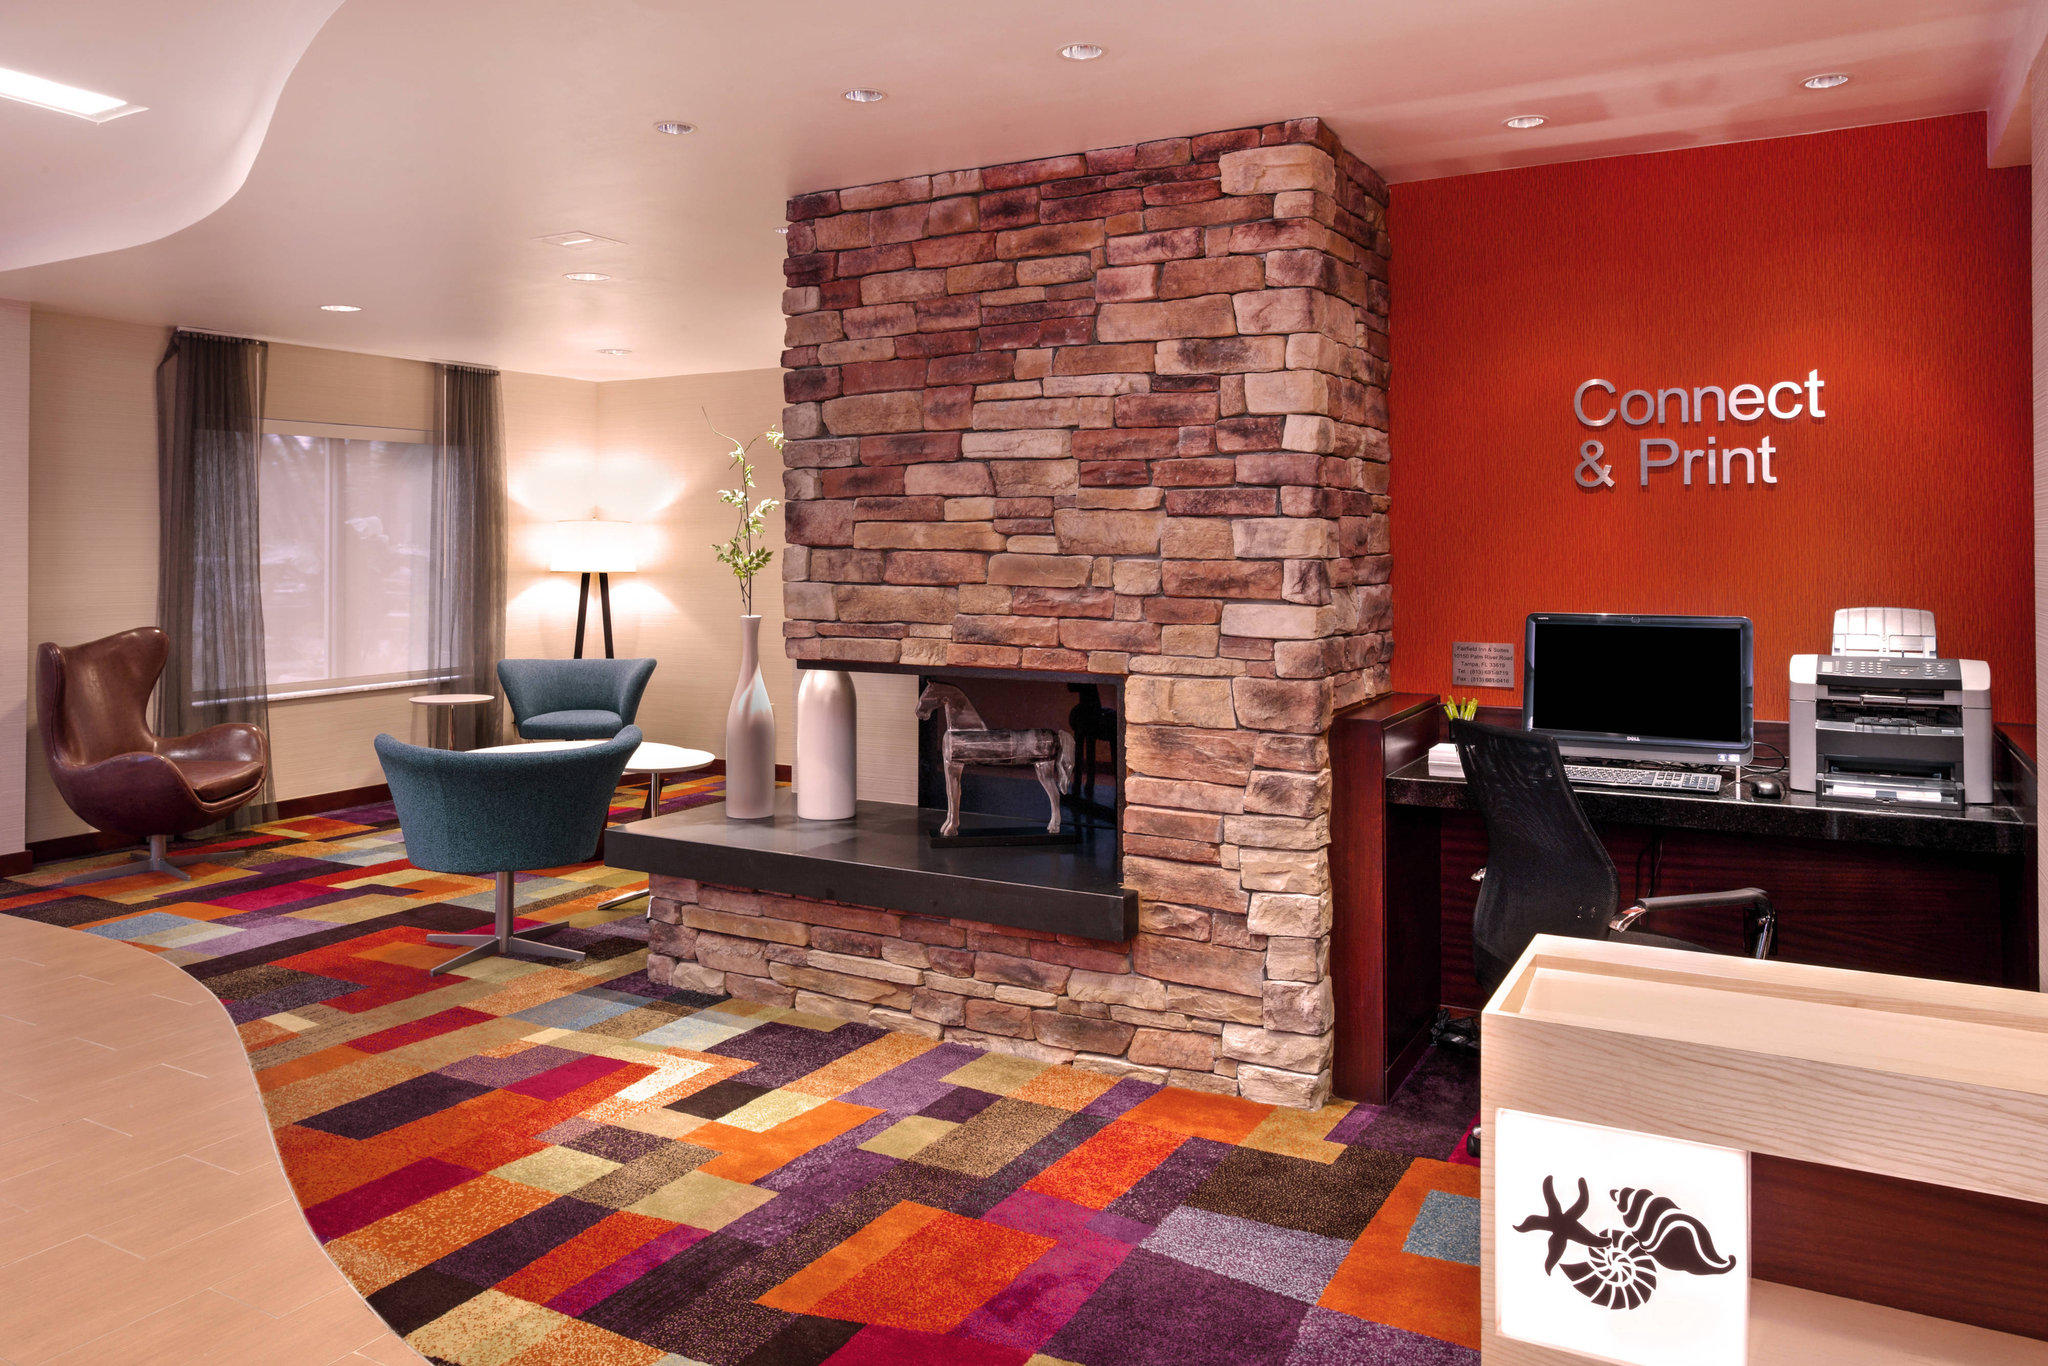 Fairfield Inn & Suites by Marriott Tampa Brandon